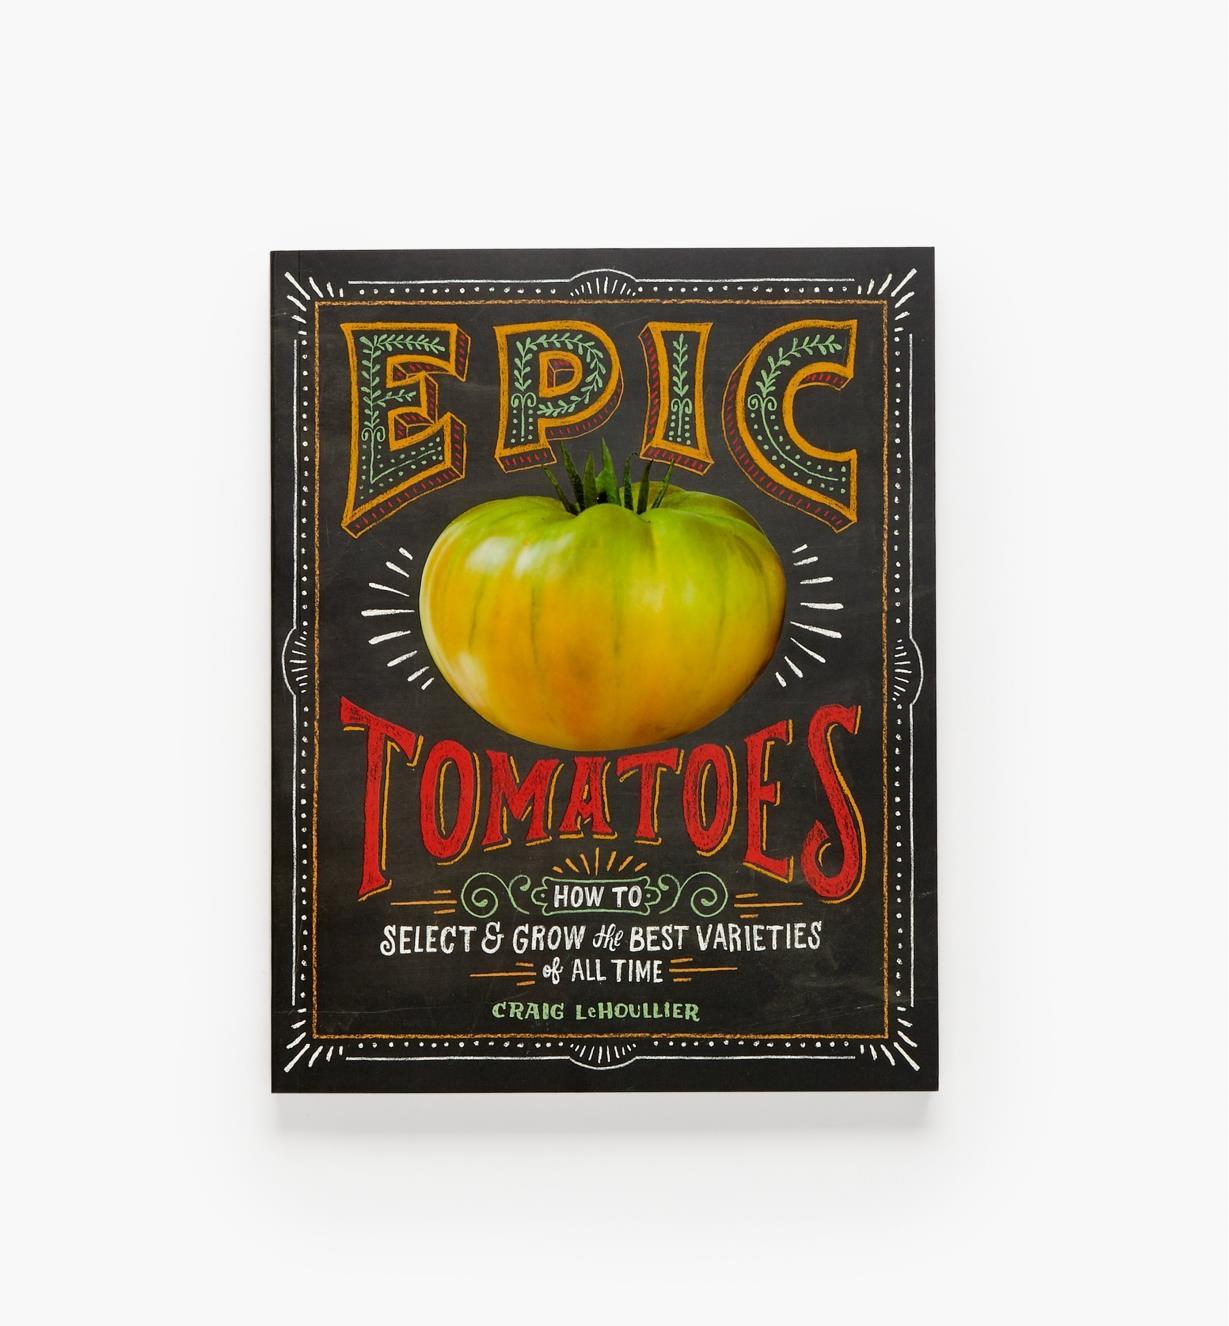 LA961 - Epic Tomatoes